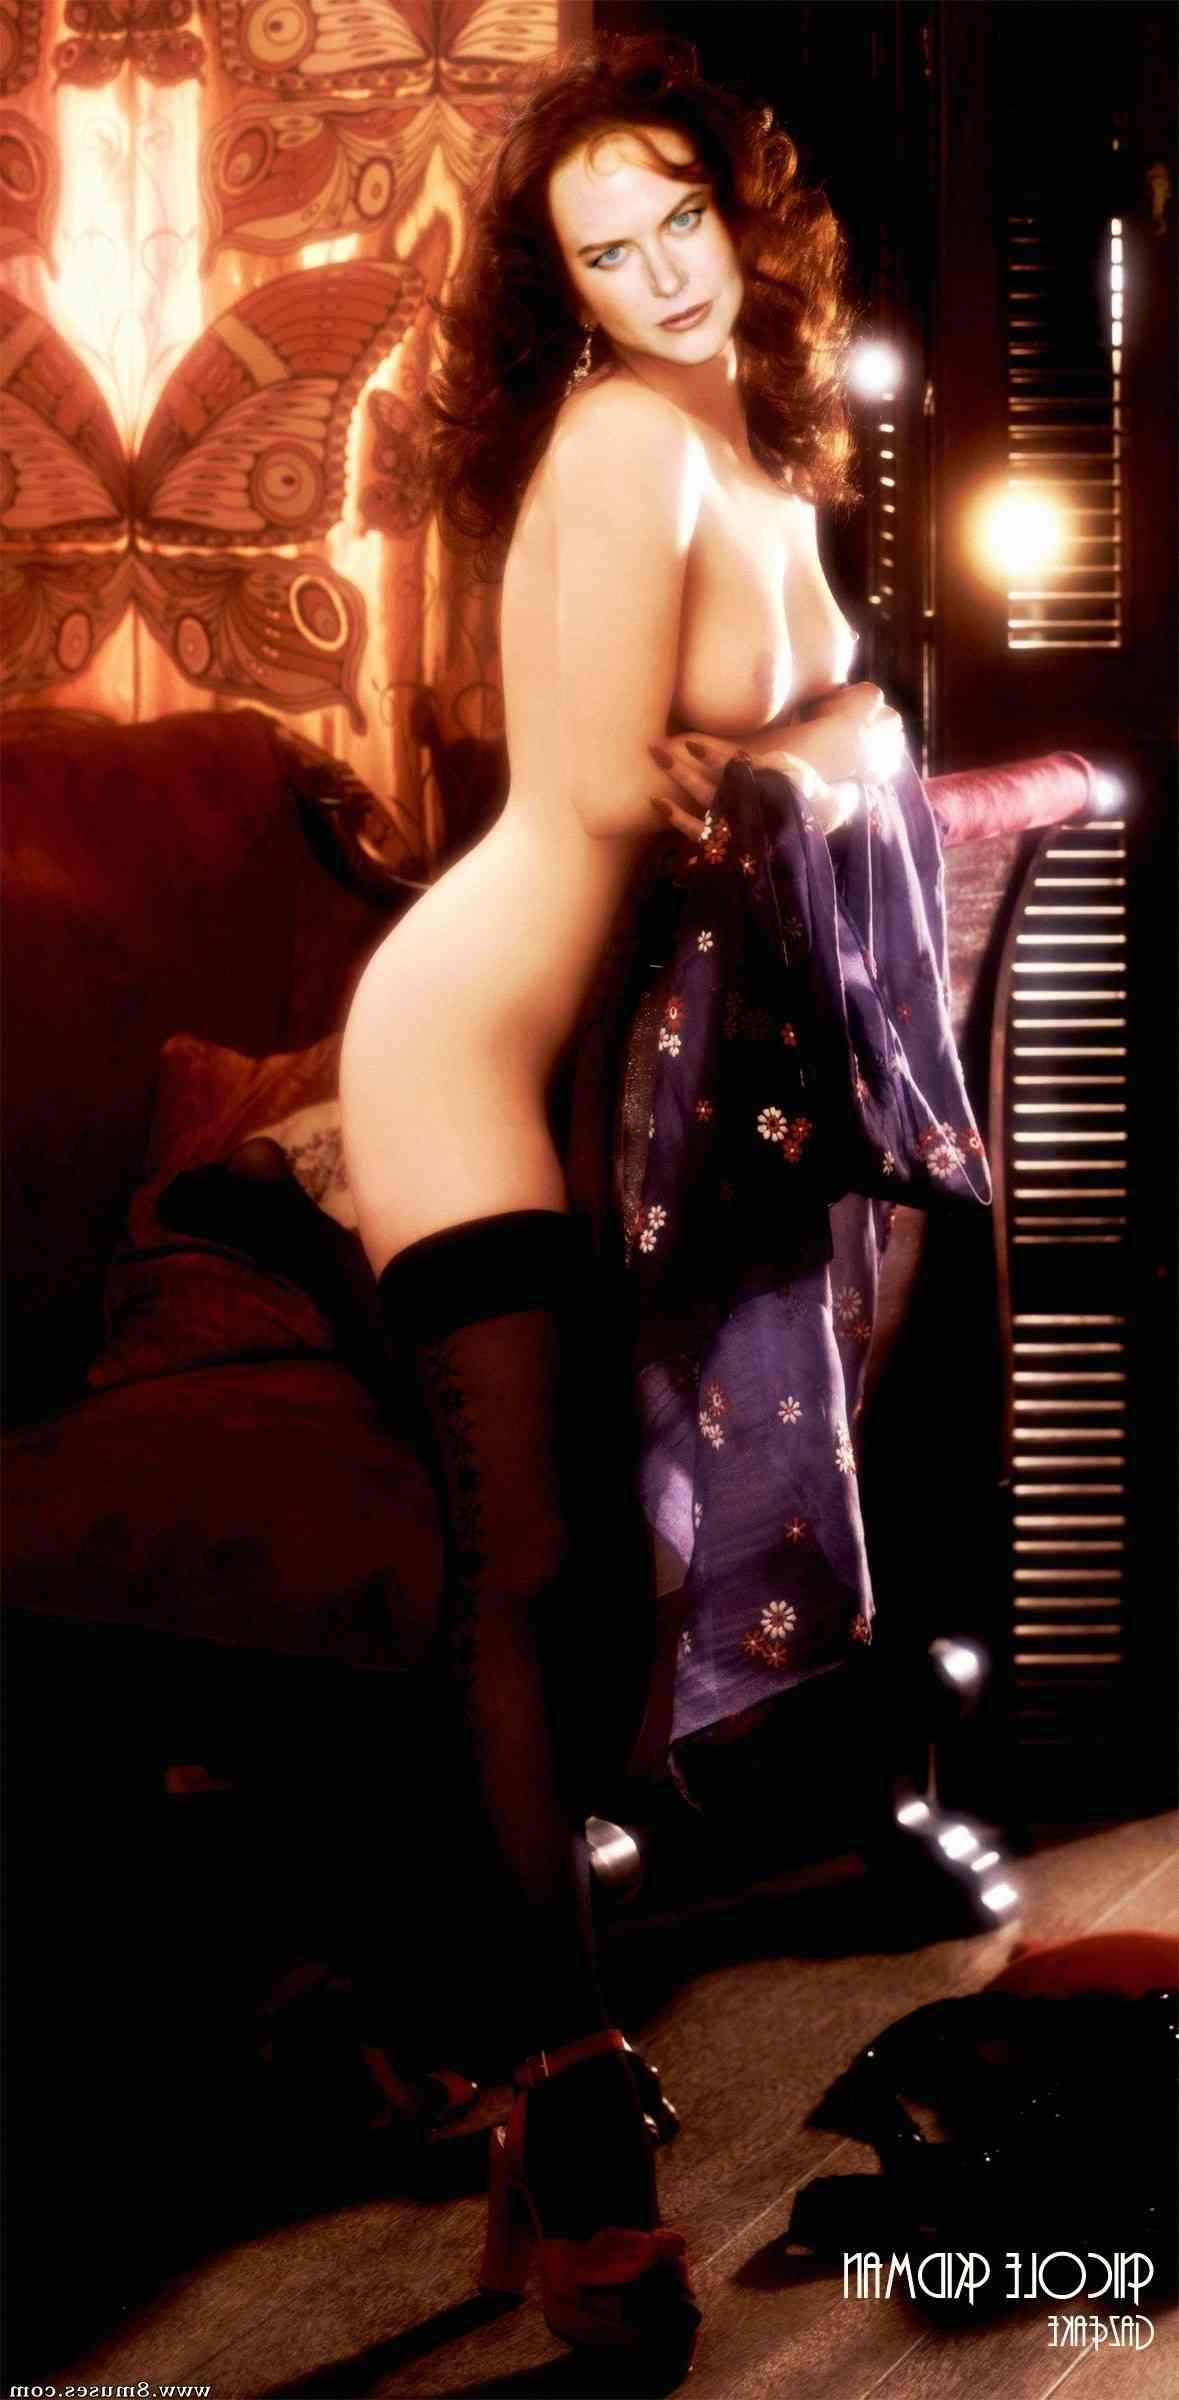 Fake-Celebrities-Sex-Pictures/Nicole-Kidman Nicole_Kidman__8muses_-_Sex_and_Porn_Comics_486.jpg